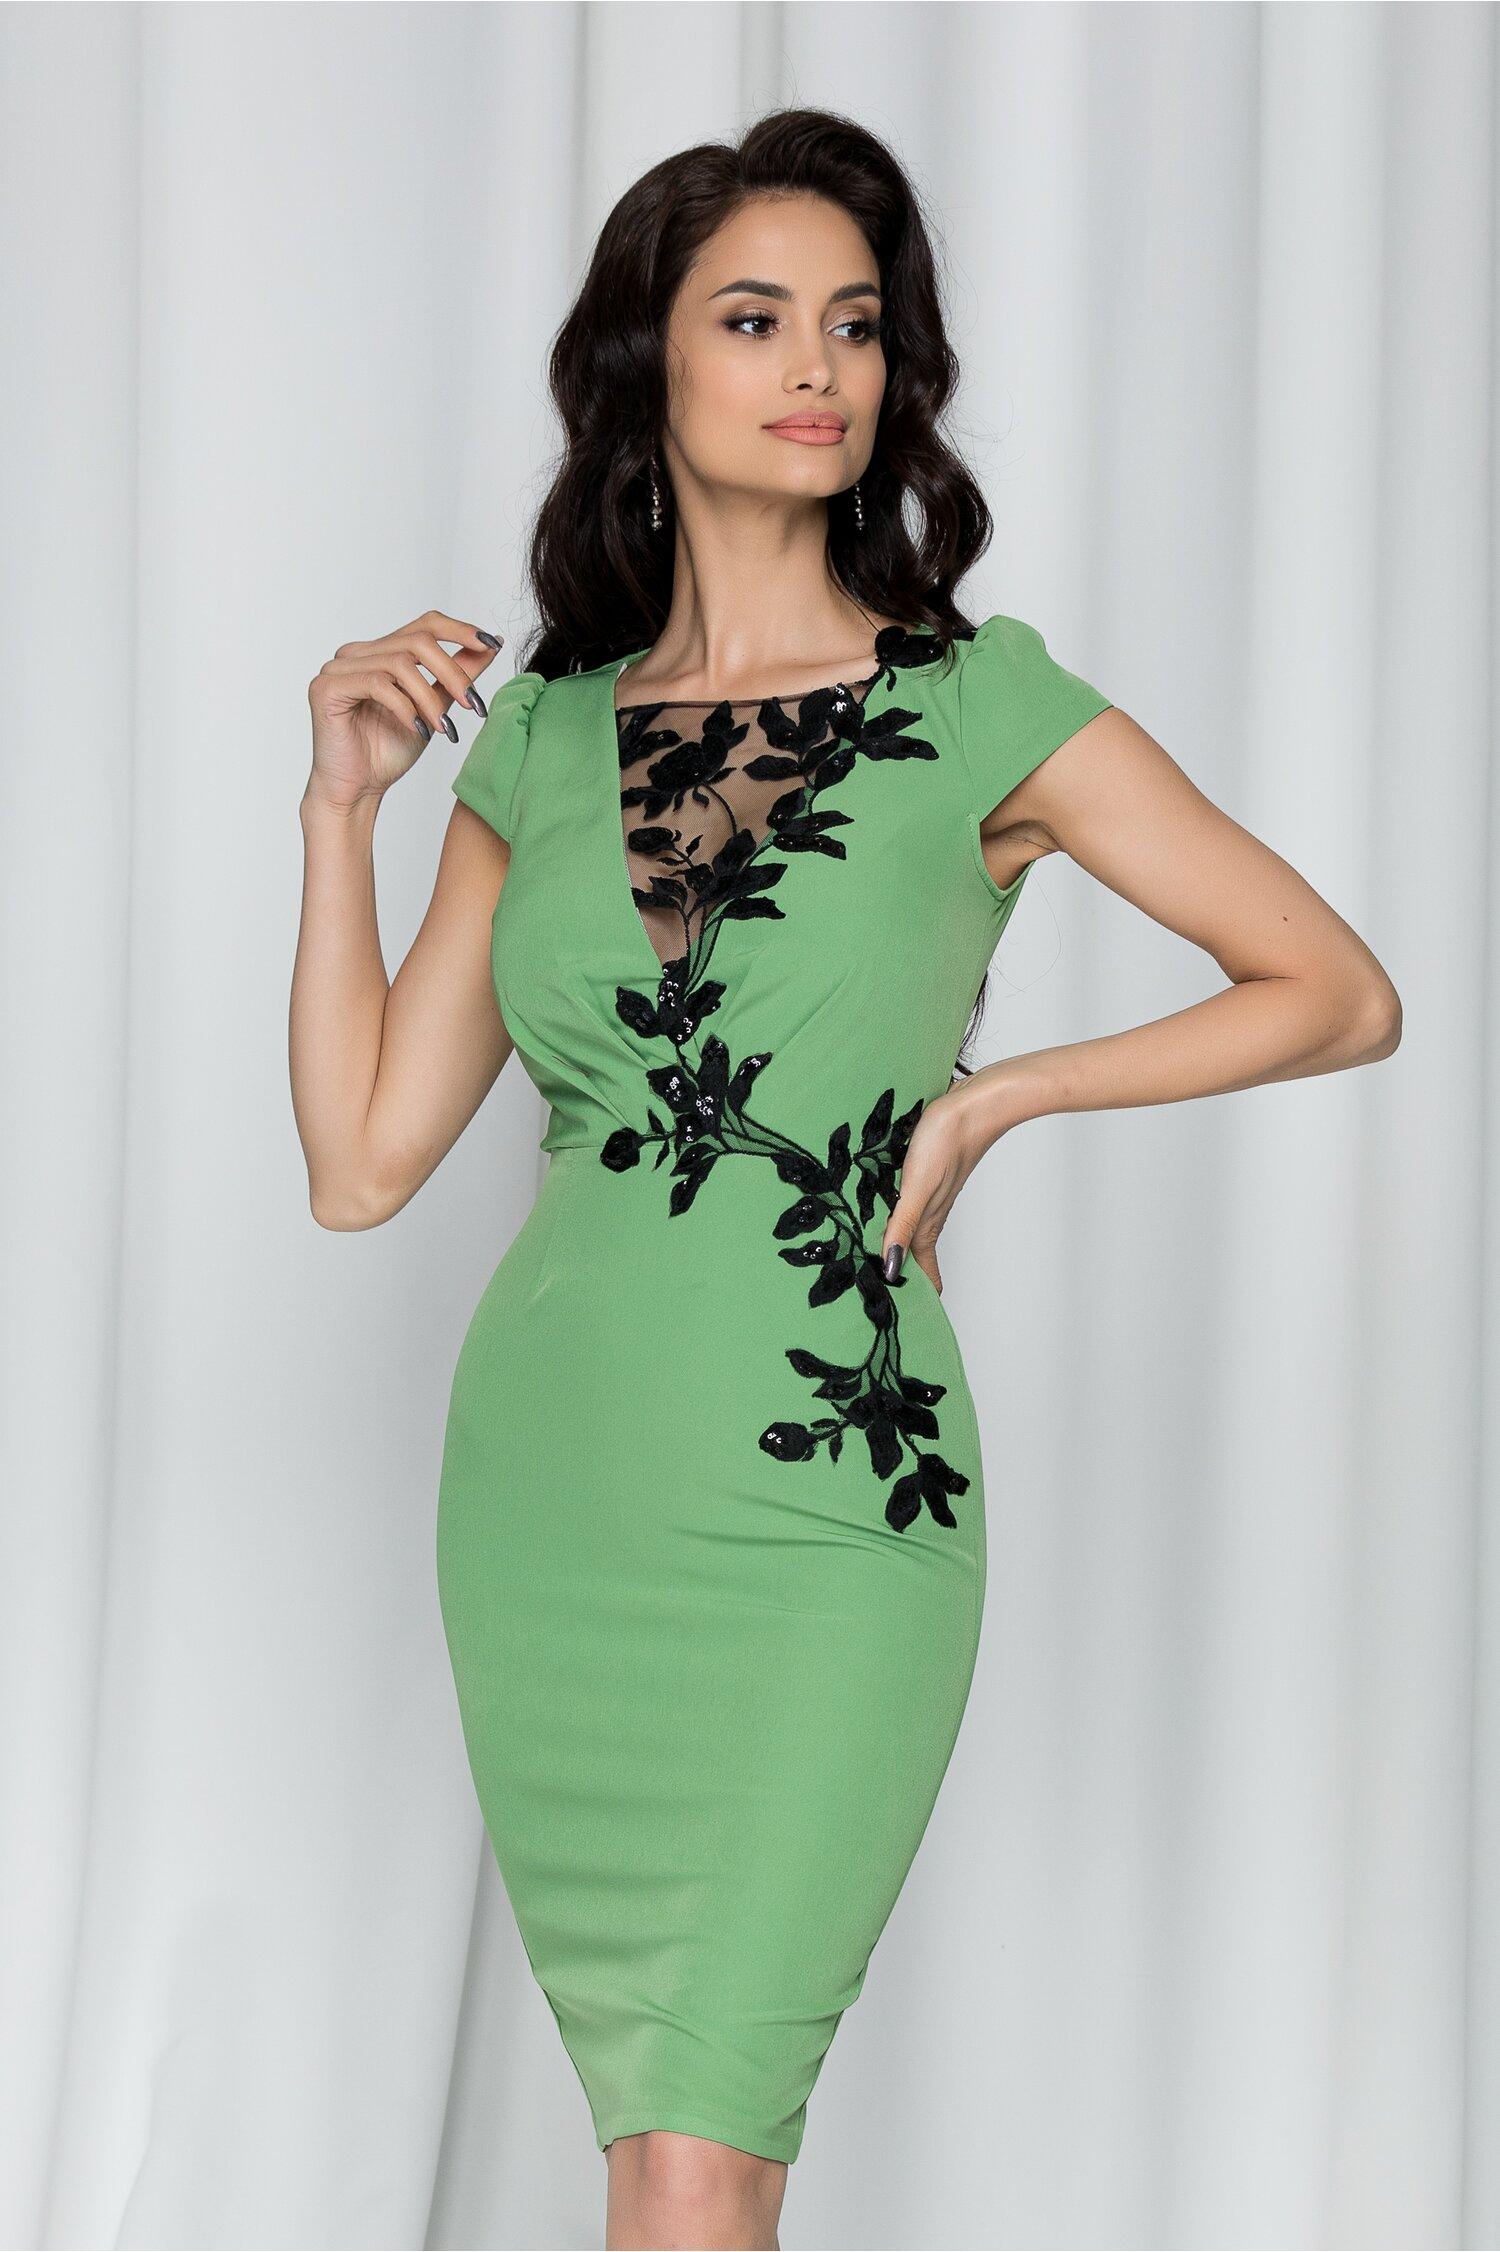 Rochie MBG verde cu broderie florala si tull la bust